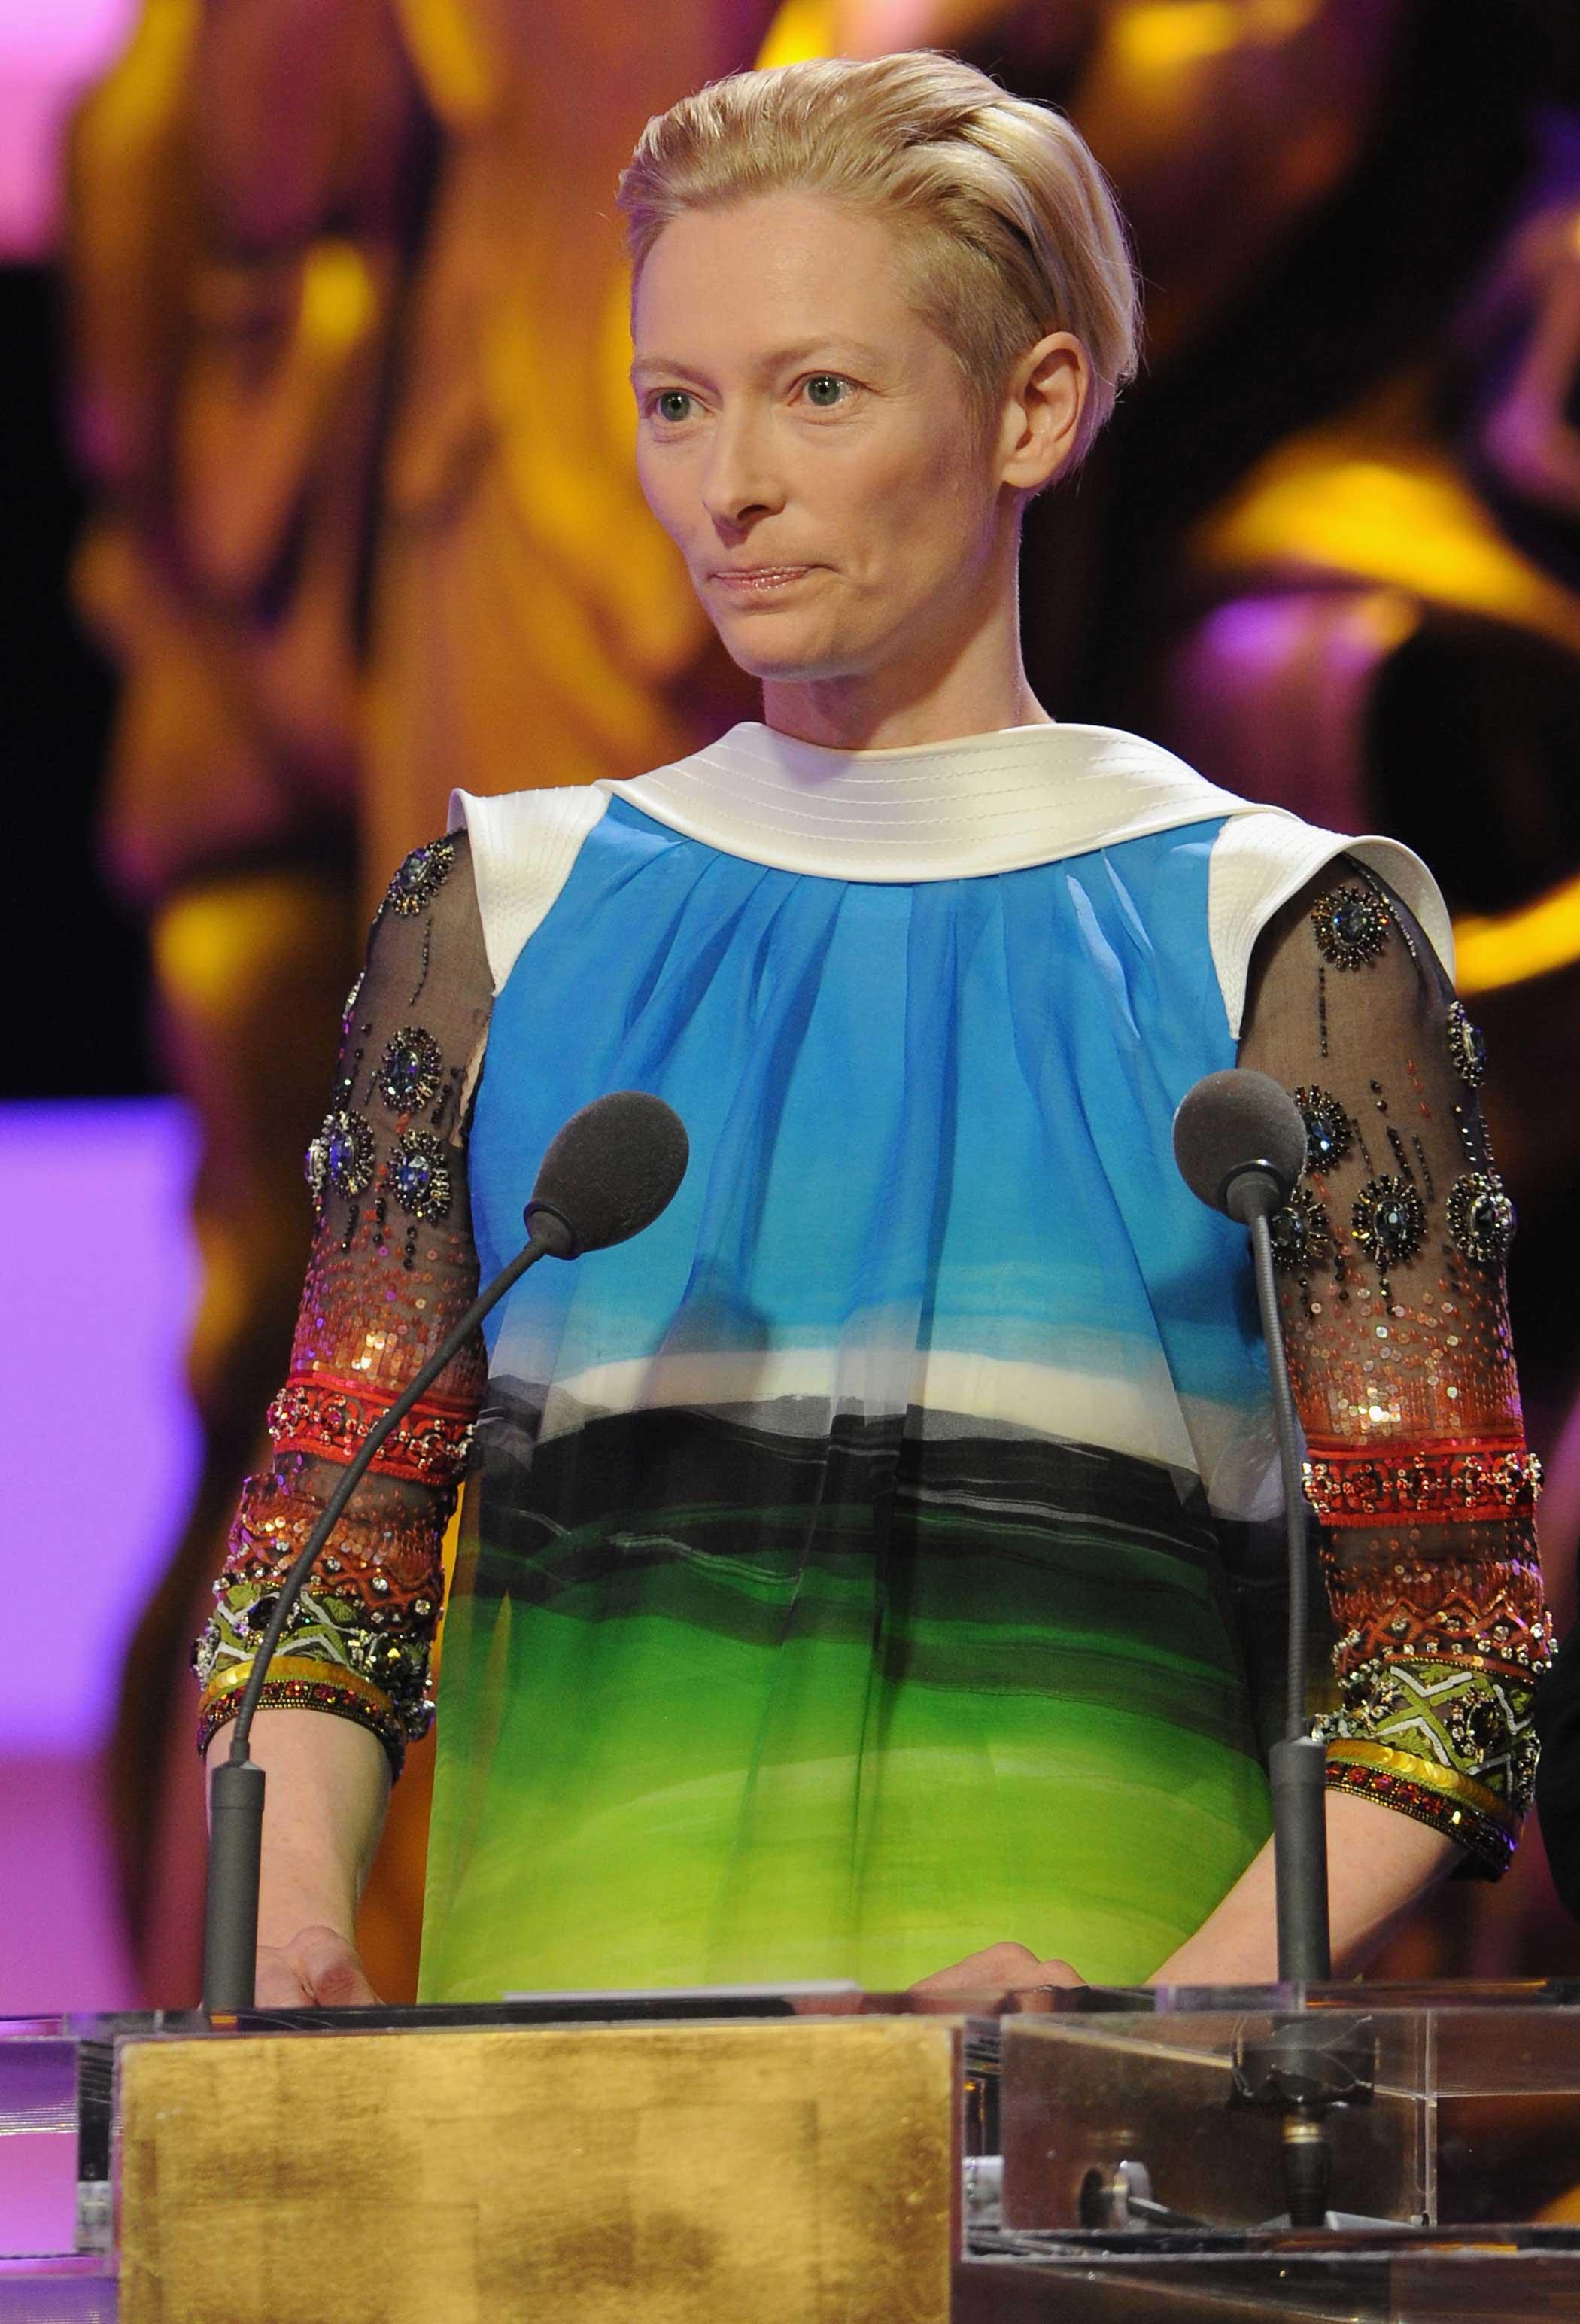 Tilda Swinton onstage during the Cesar Film Awards on Feb. 27, 2009 in Paris.